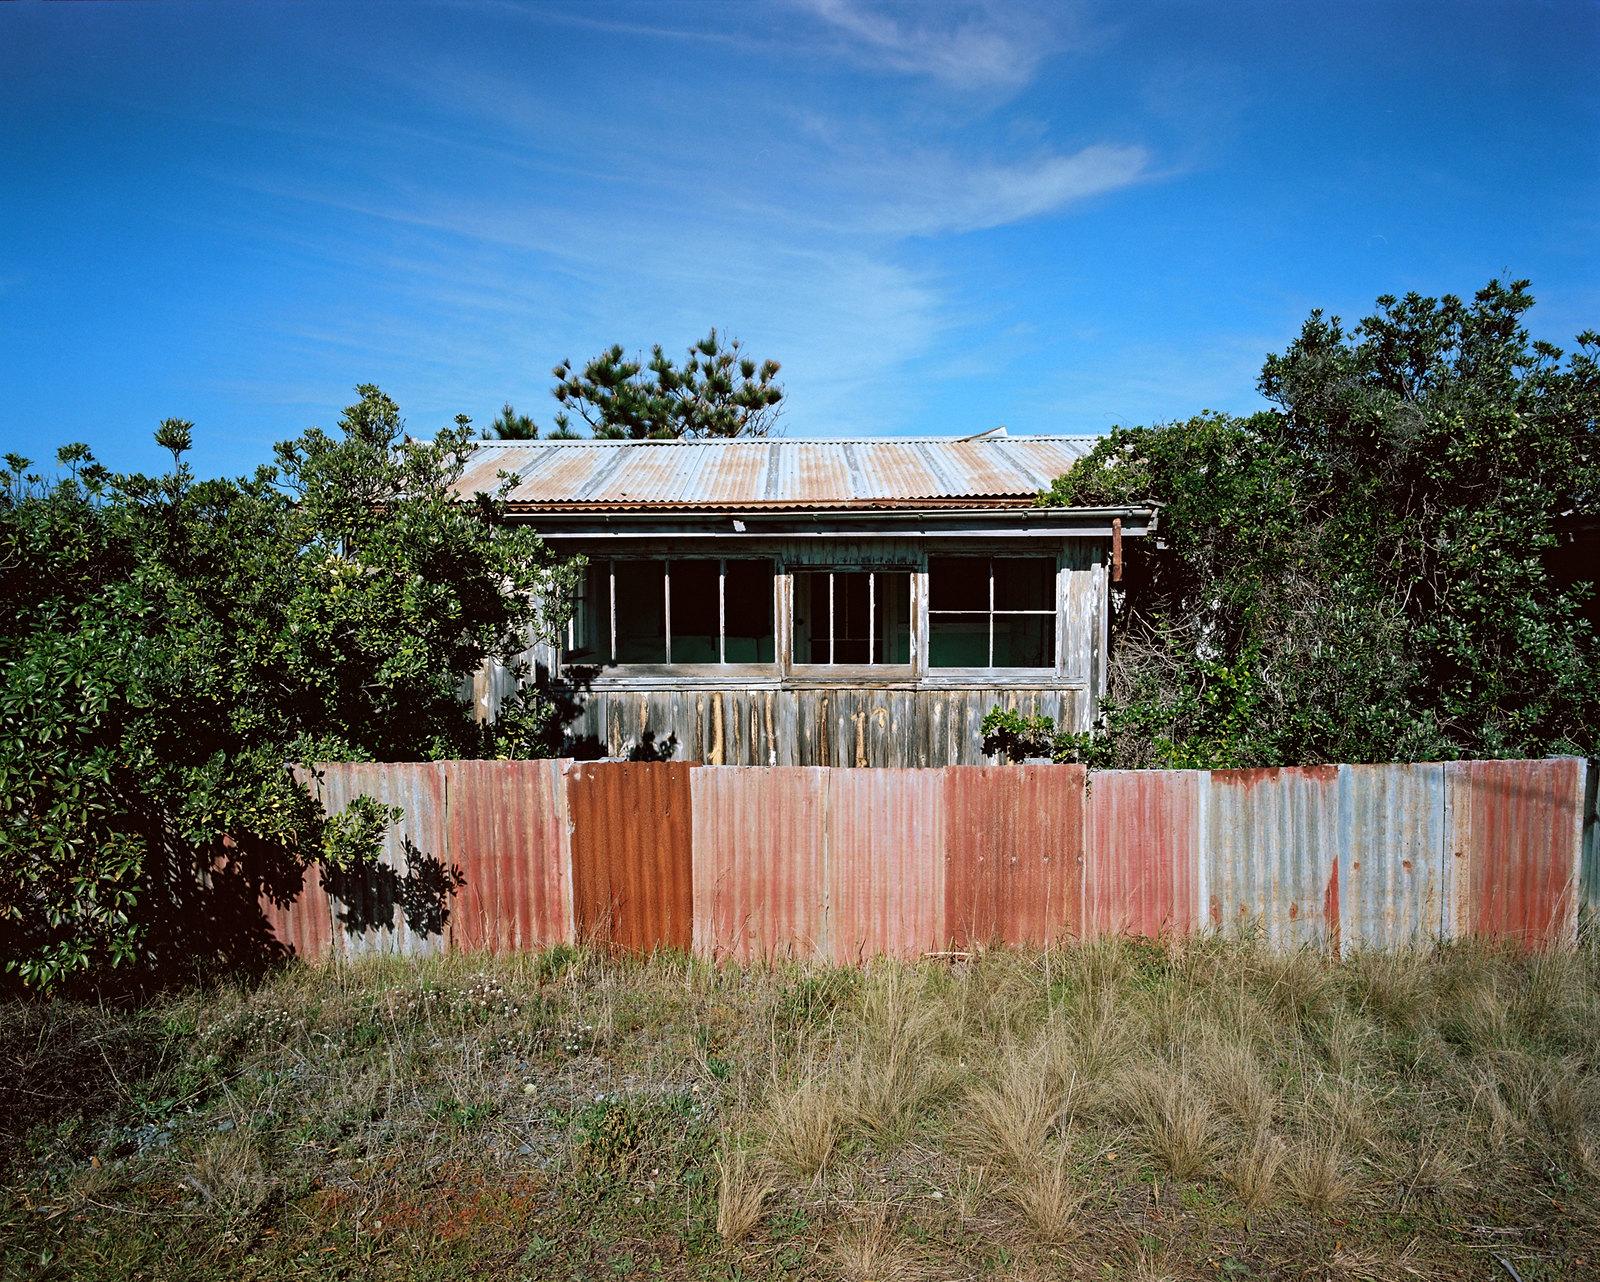 Birdling's House